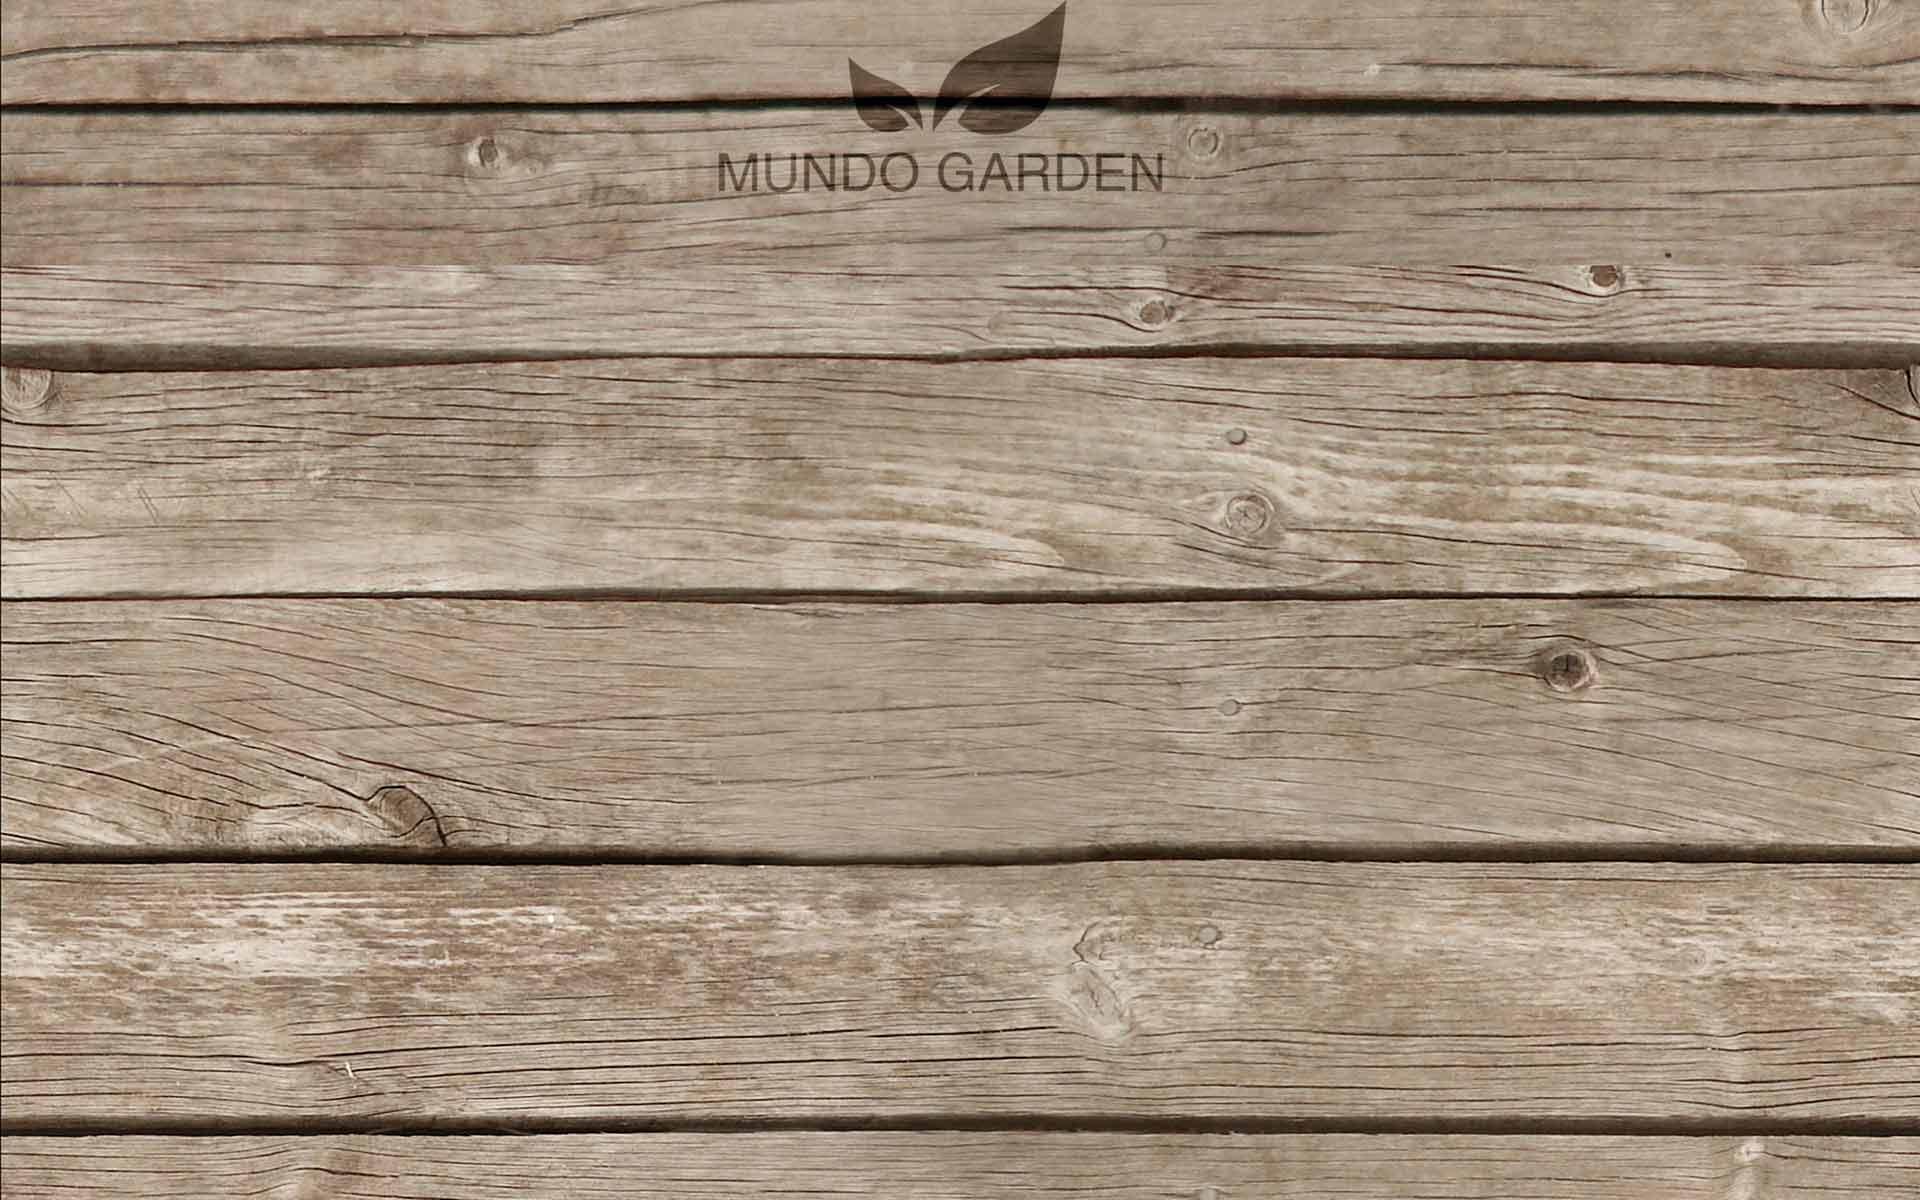 Mundo Garden Muebles de Jardin